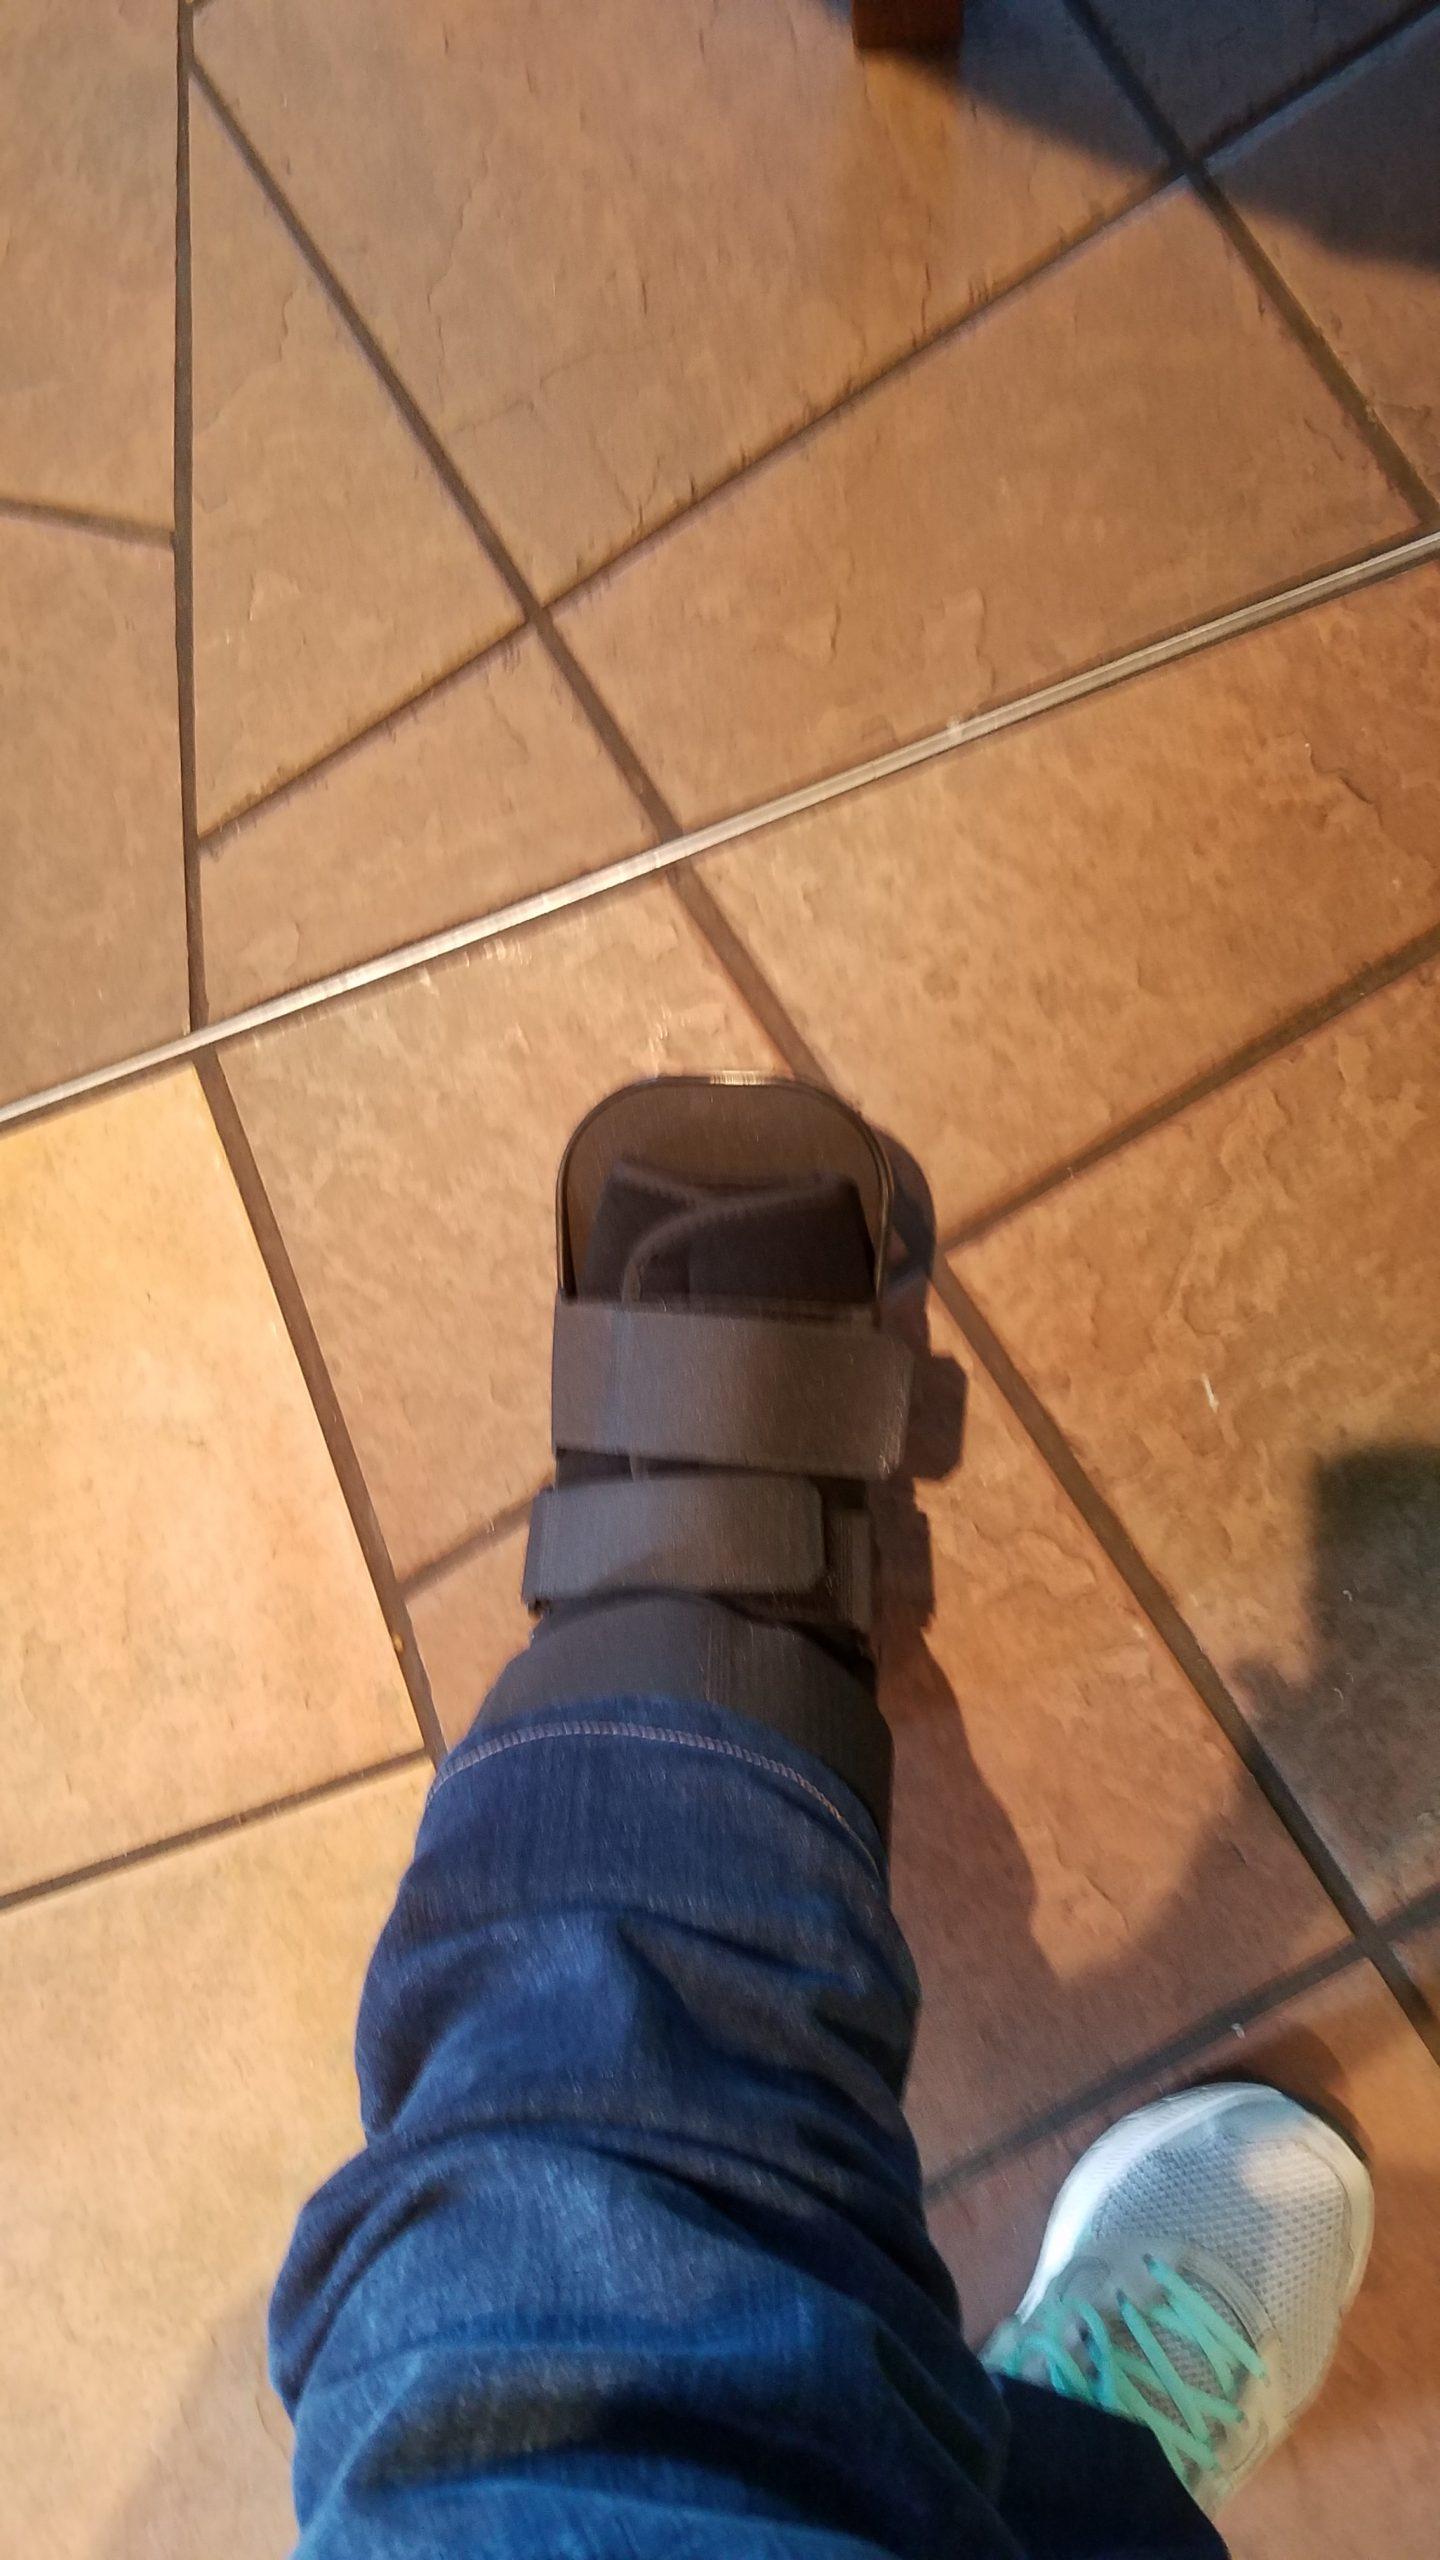 My boot.